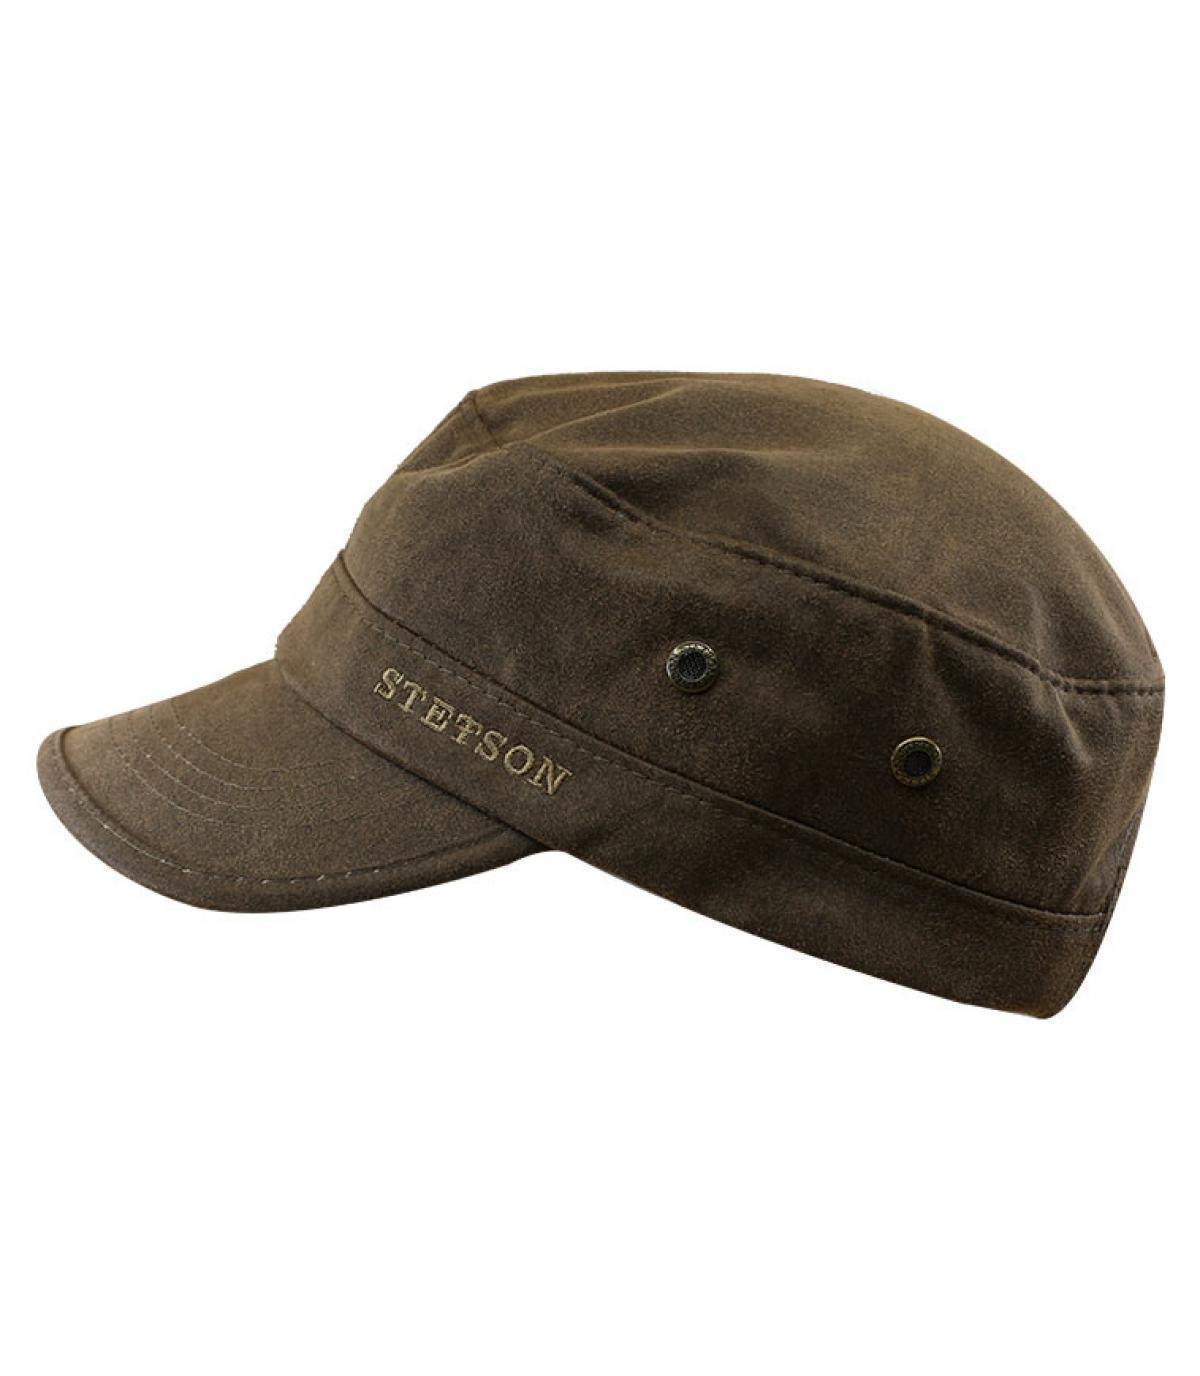 Detalles Army Cap CO/PES brown imagen 2